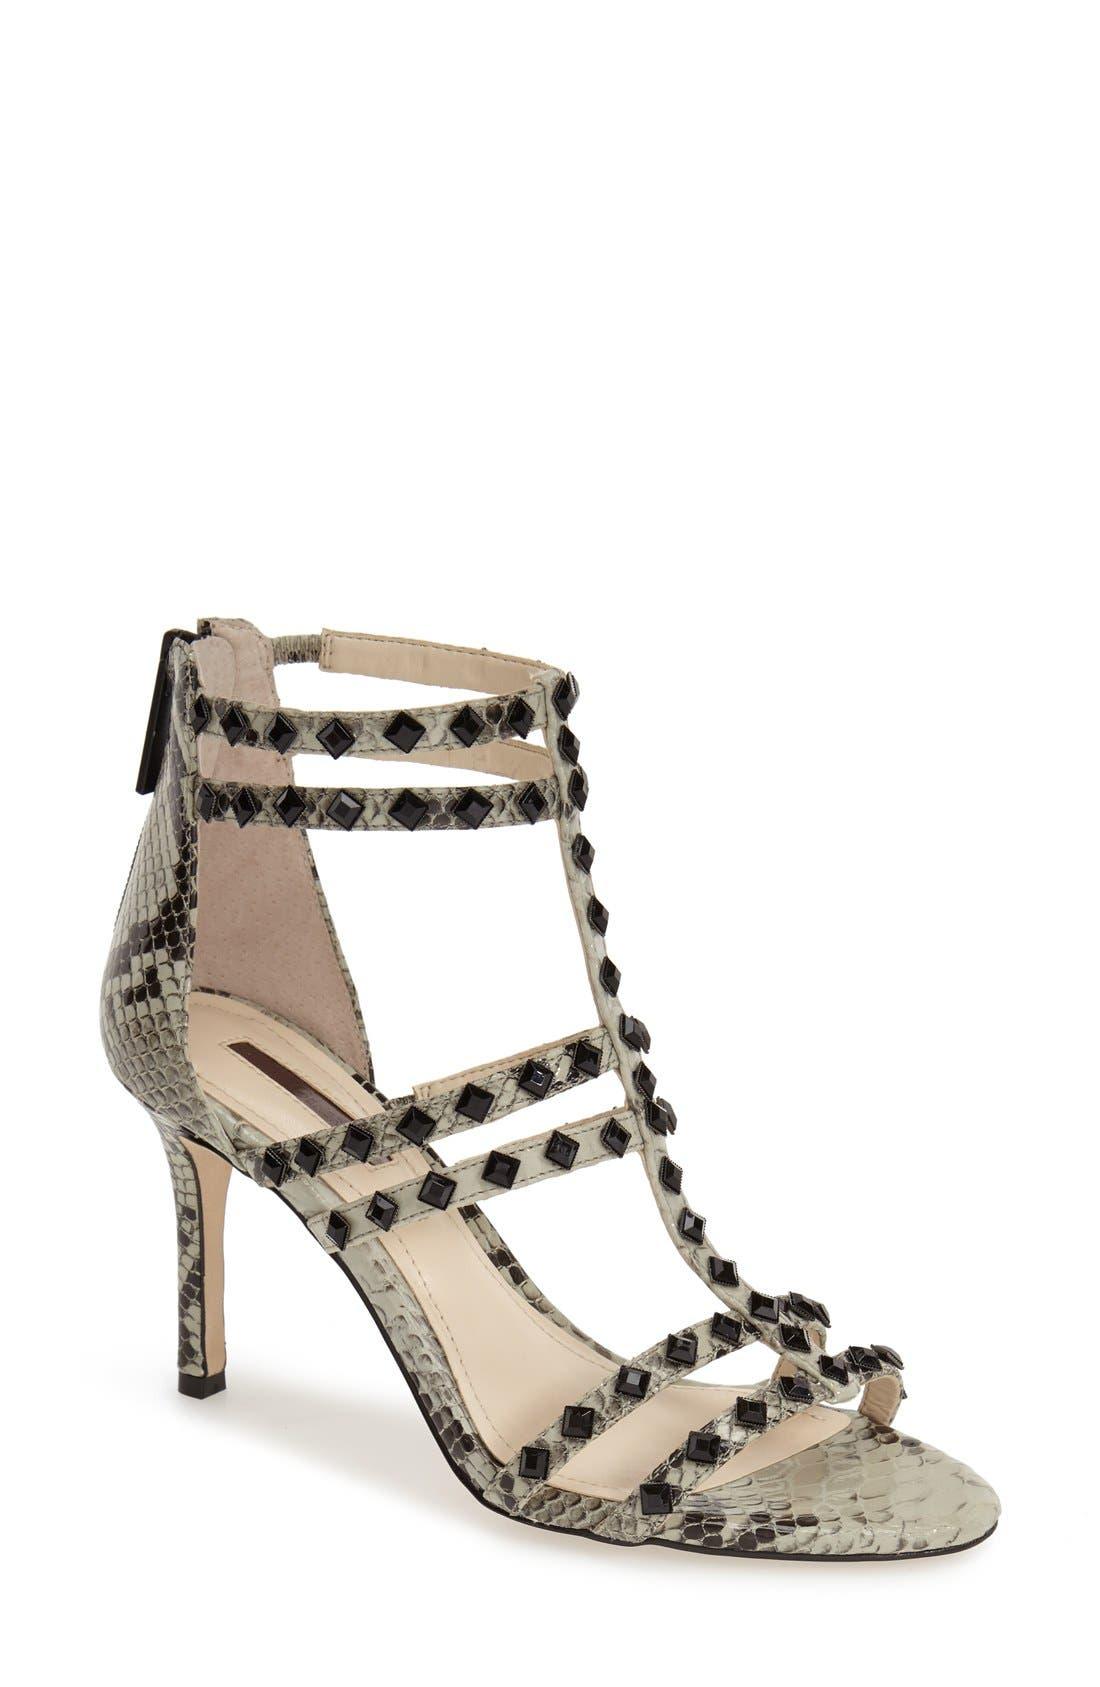 Alternate Image 1 Selected - BCBGeneration 'Dariah' Studded T-Strap Sandal (Women)